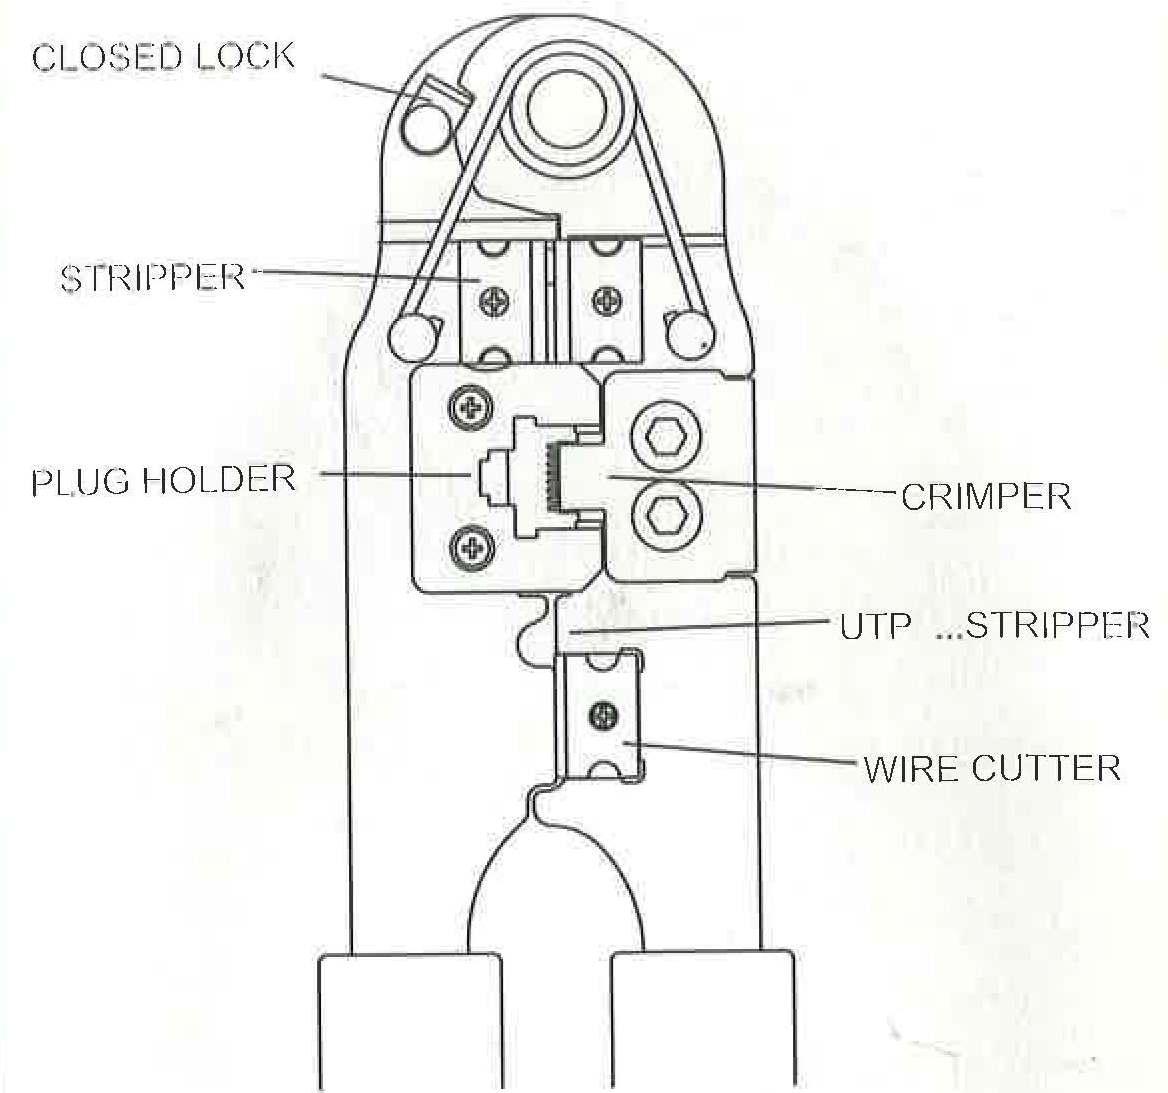 6p6c Rj12 6p4c Rj11 Modular Plug Crimp Tool